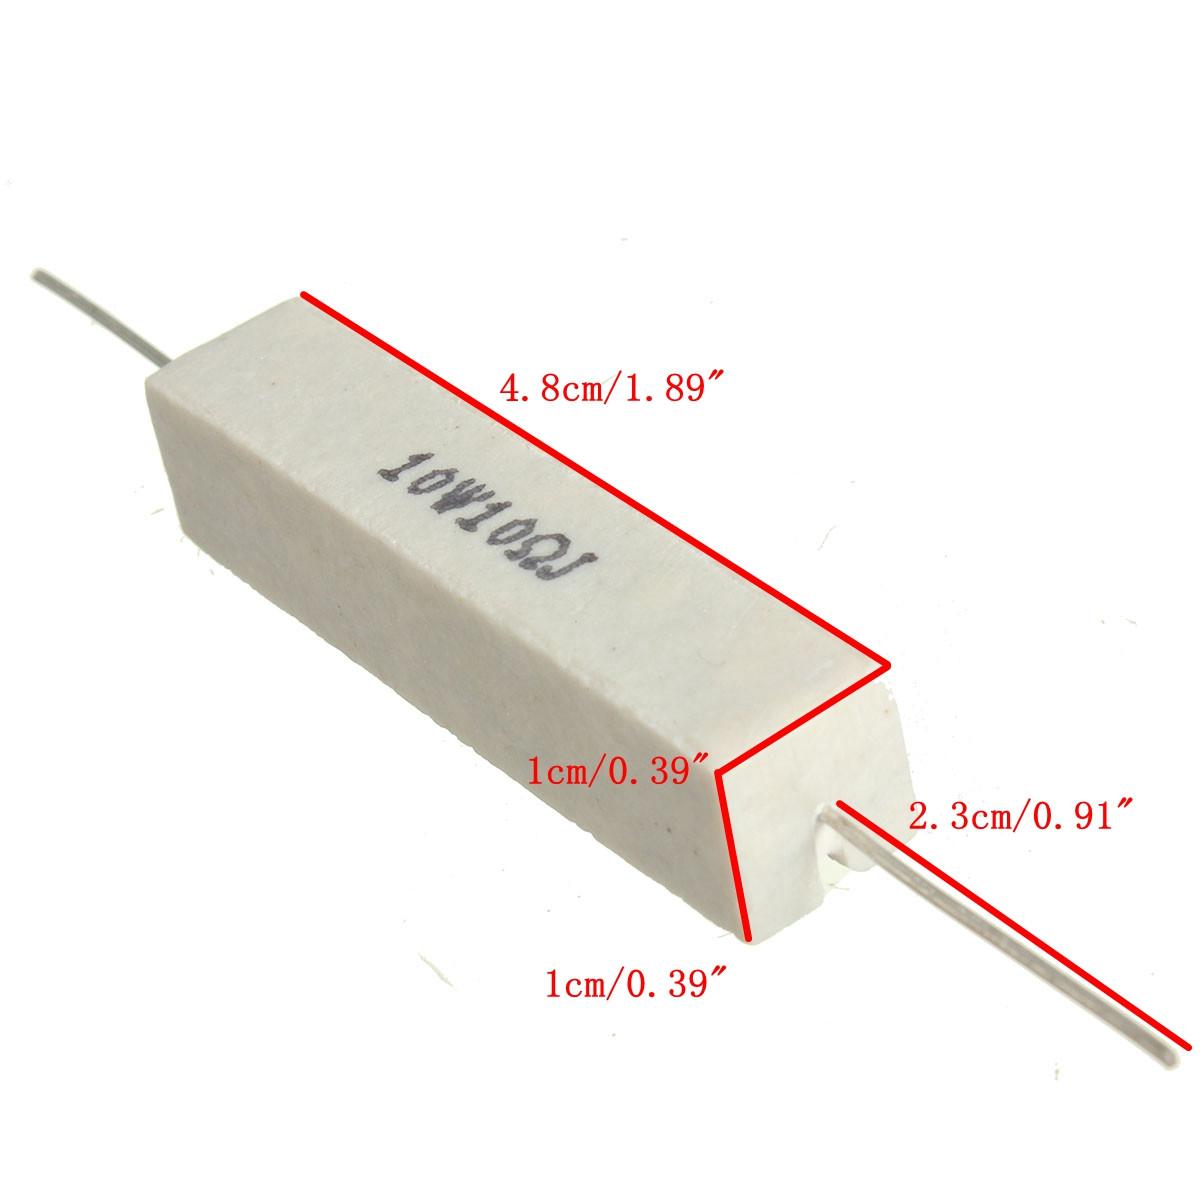 10w 10 ohm 10ΩJ Ceramic Cement Power Resistor Flame Resistance ± 5% J